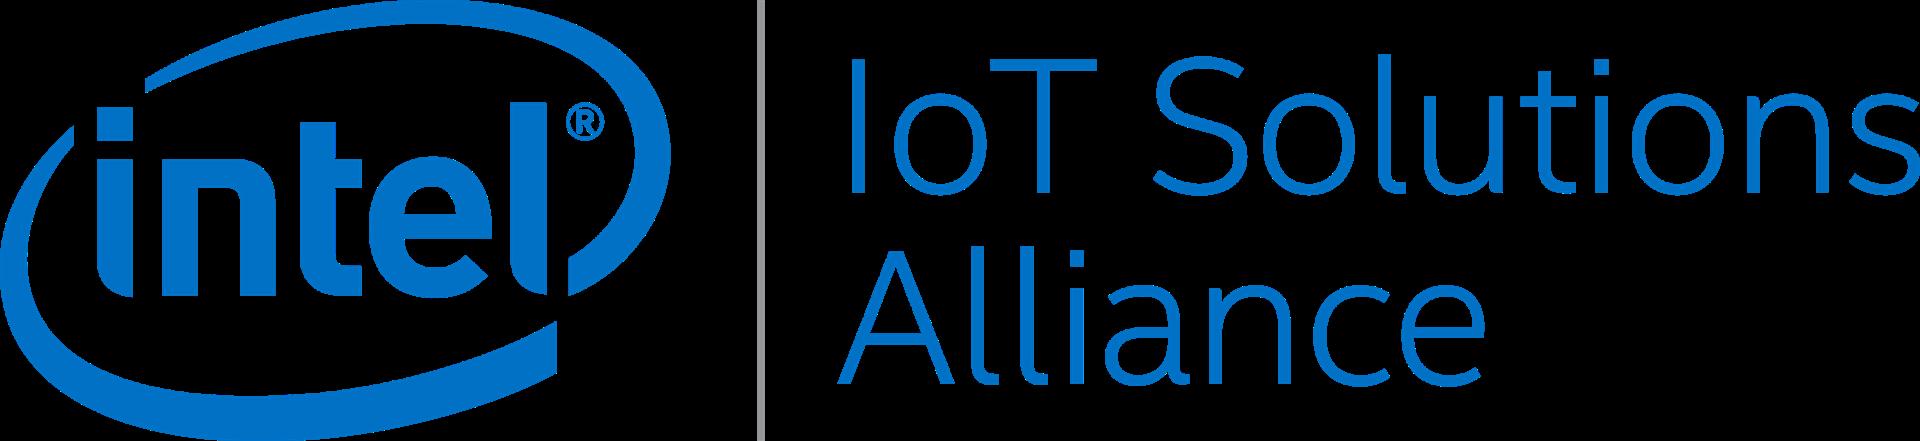 Intel IoT Solutions Alliance &nbsp;&nbsp; &nbsp;&nbsp;<br />